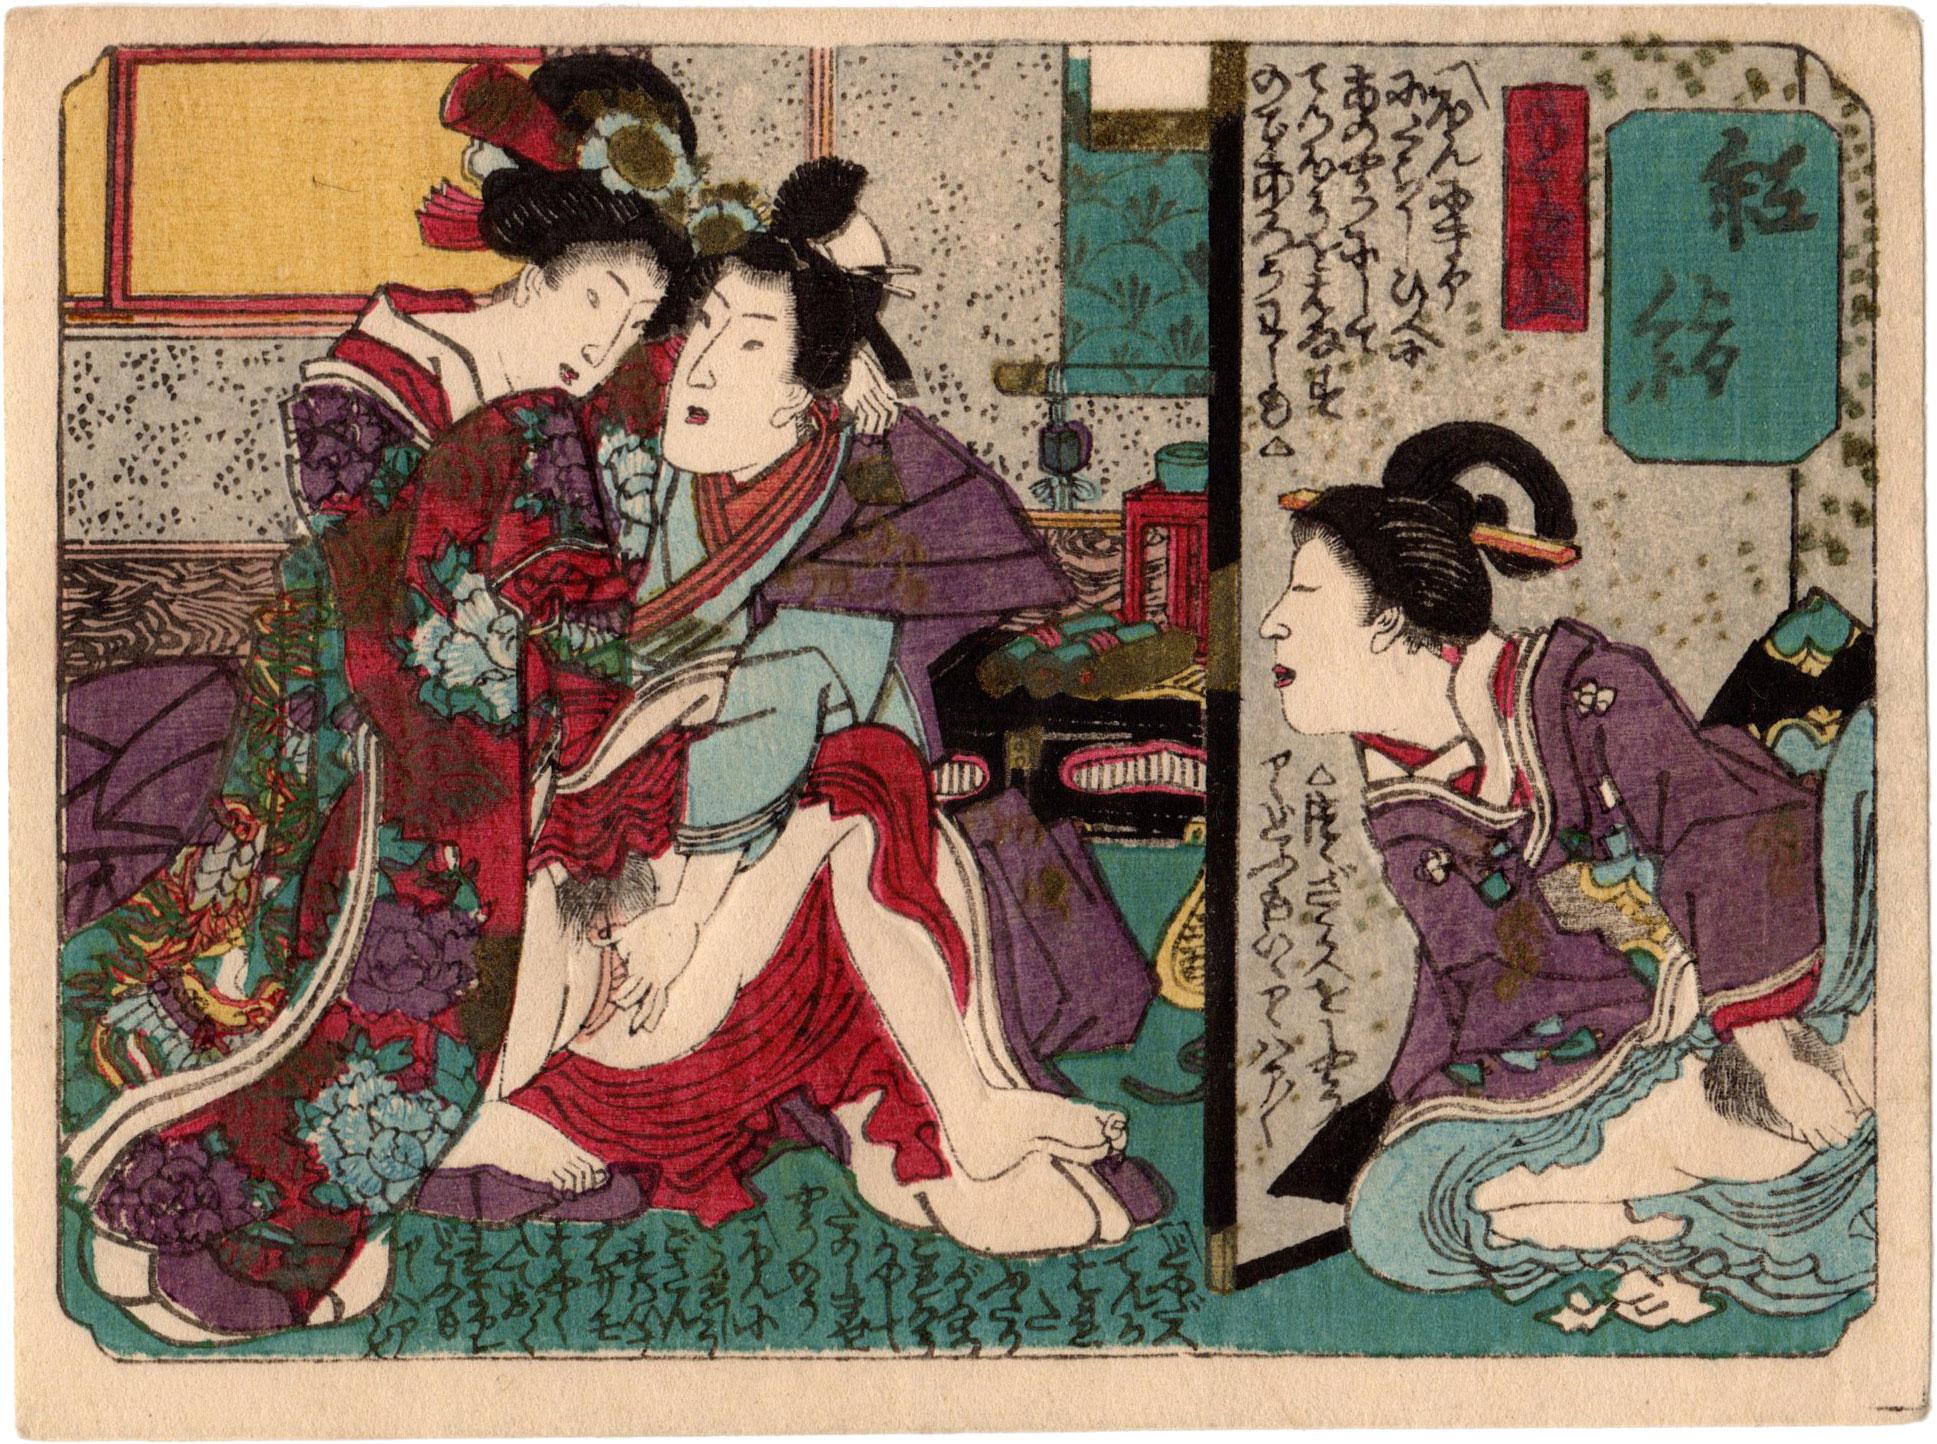 BROCADE PICTURE 03 (Utagawa School)